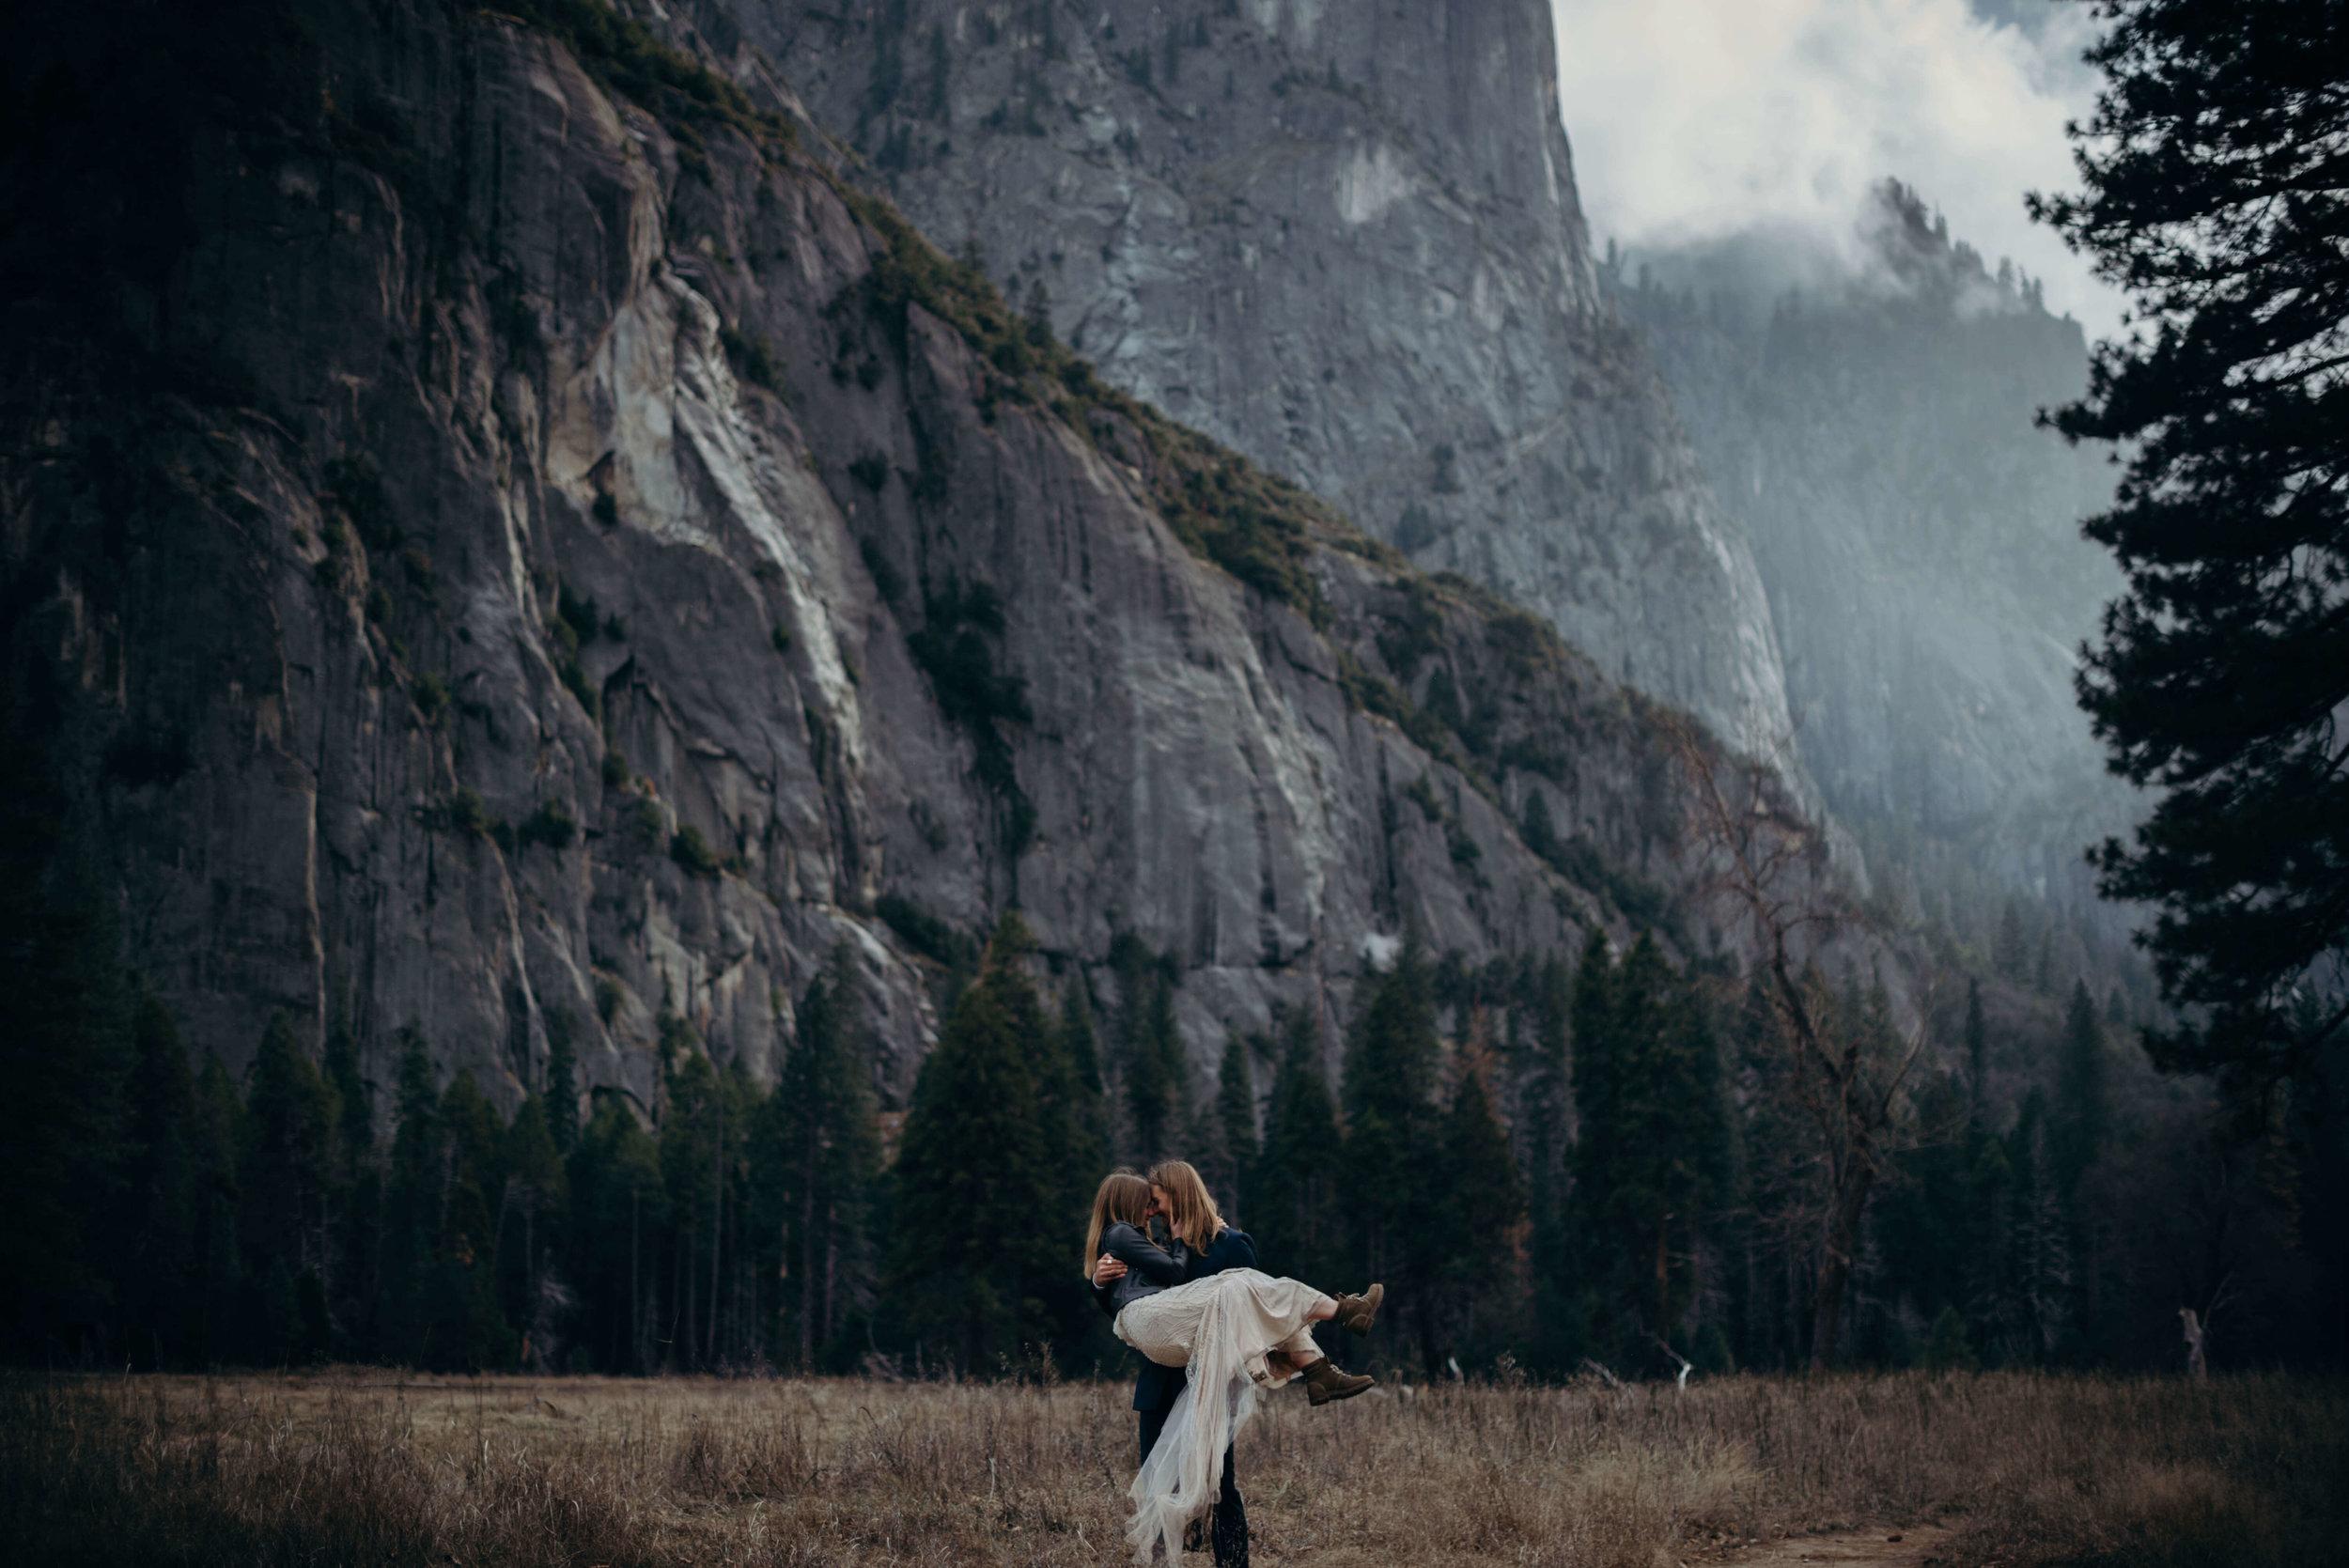 Adventure-Elopement-Yosemite-Valley-7.jpg